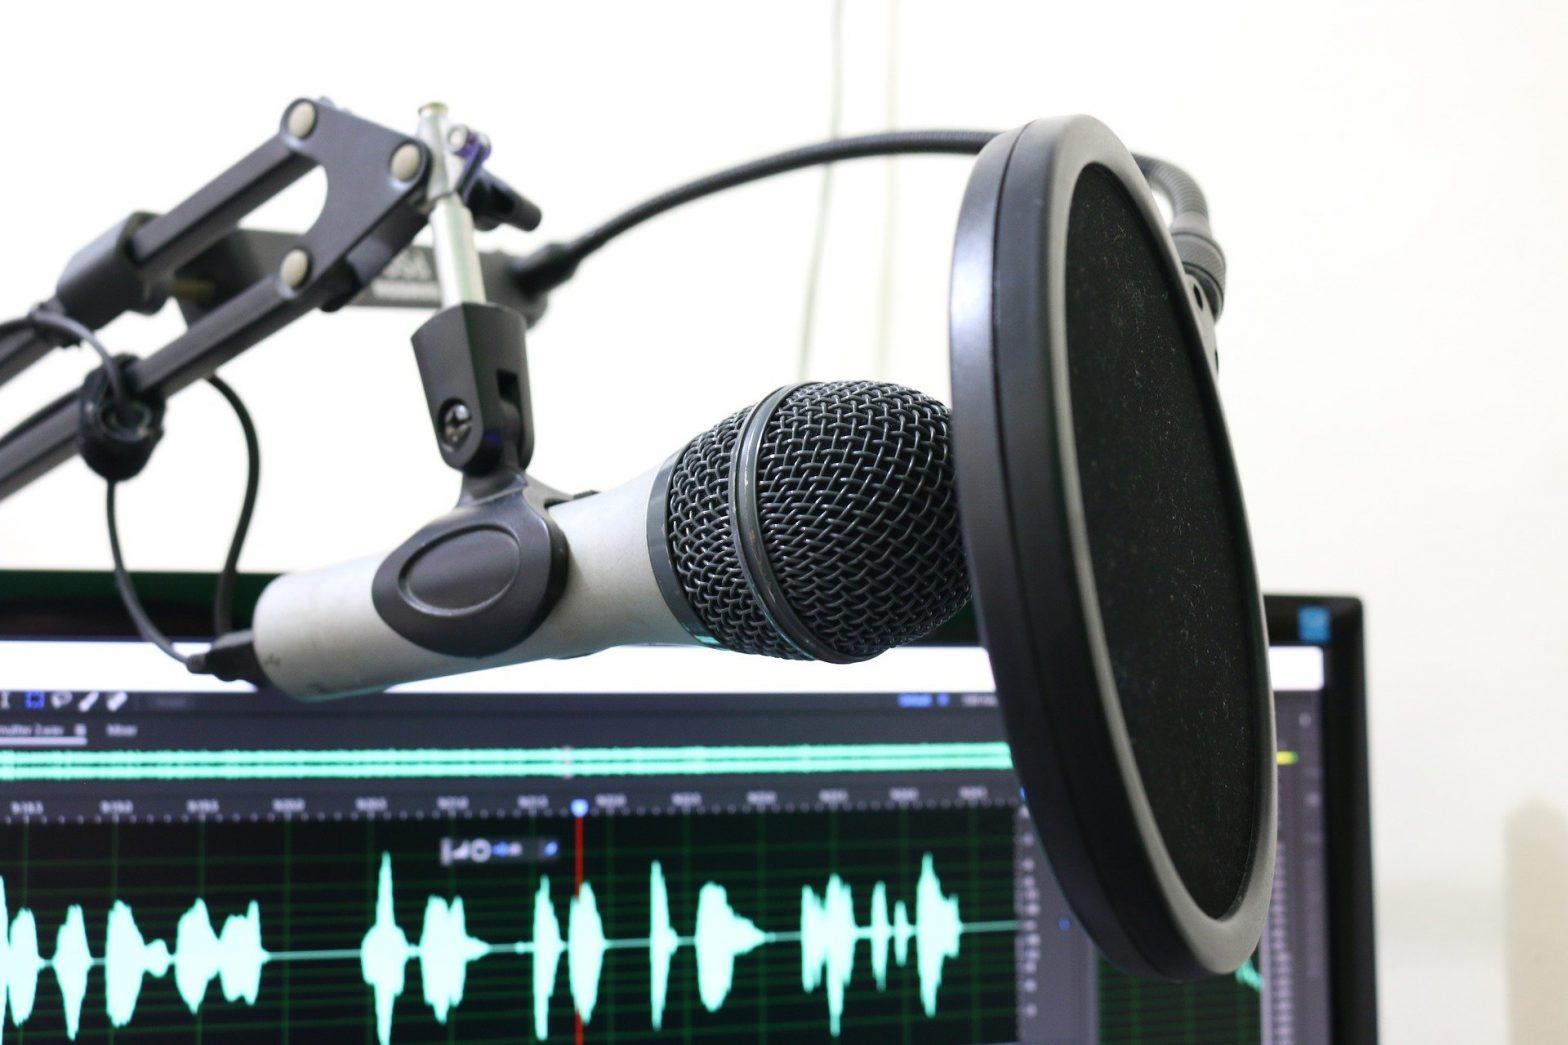 florantevaldez - microphone-2170045 auf Pixabay